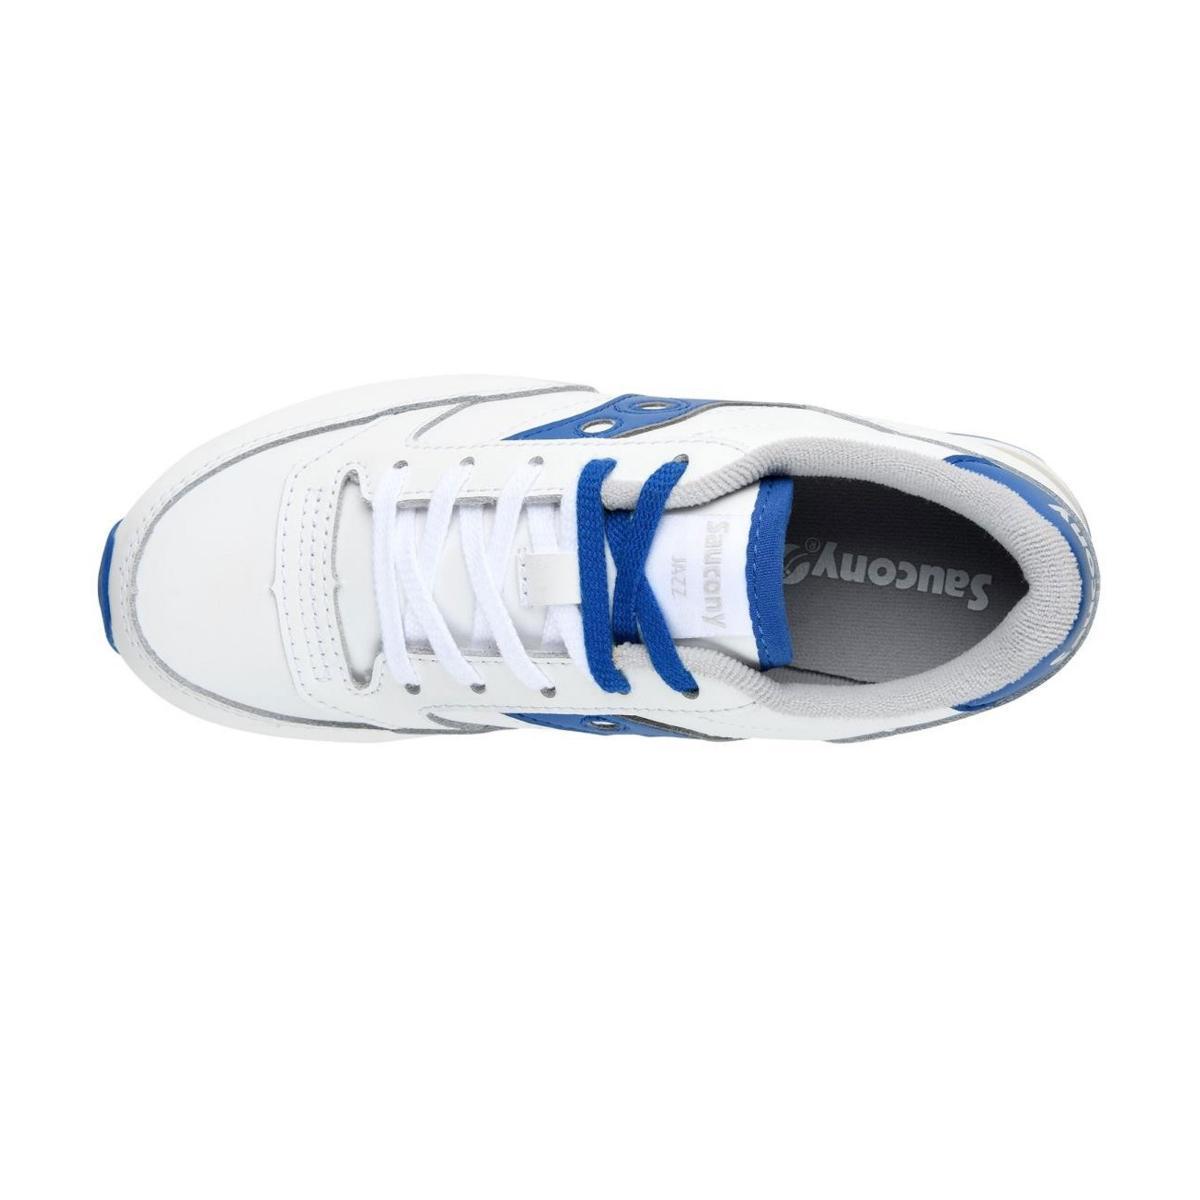 Scarpe Sneakers Saucony Jazz Original White/Blue Boys da bambino rif. SK261259